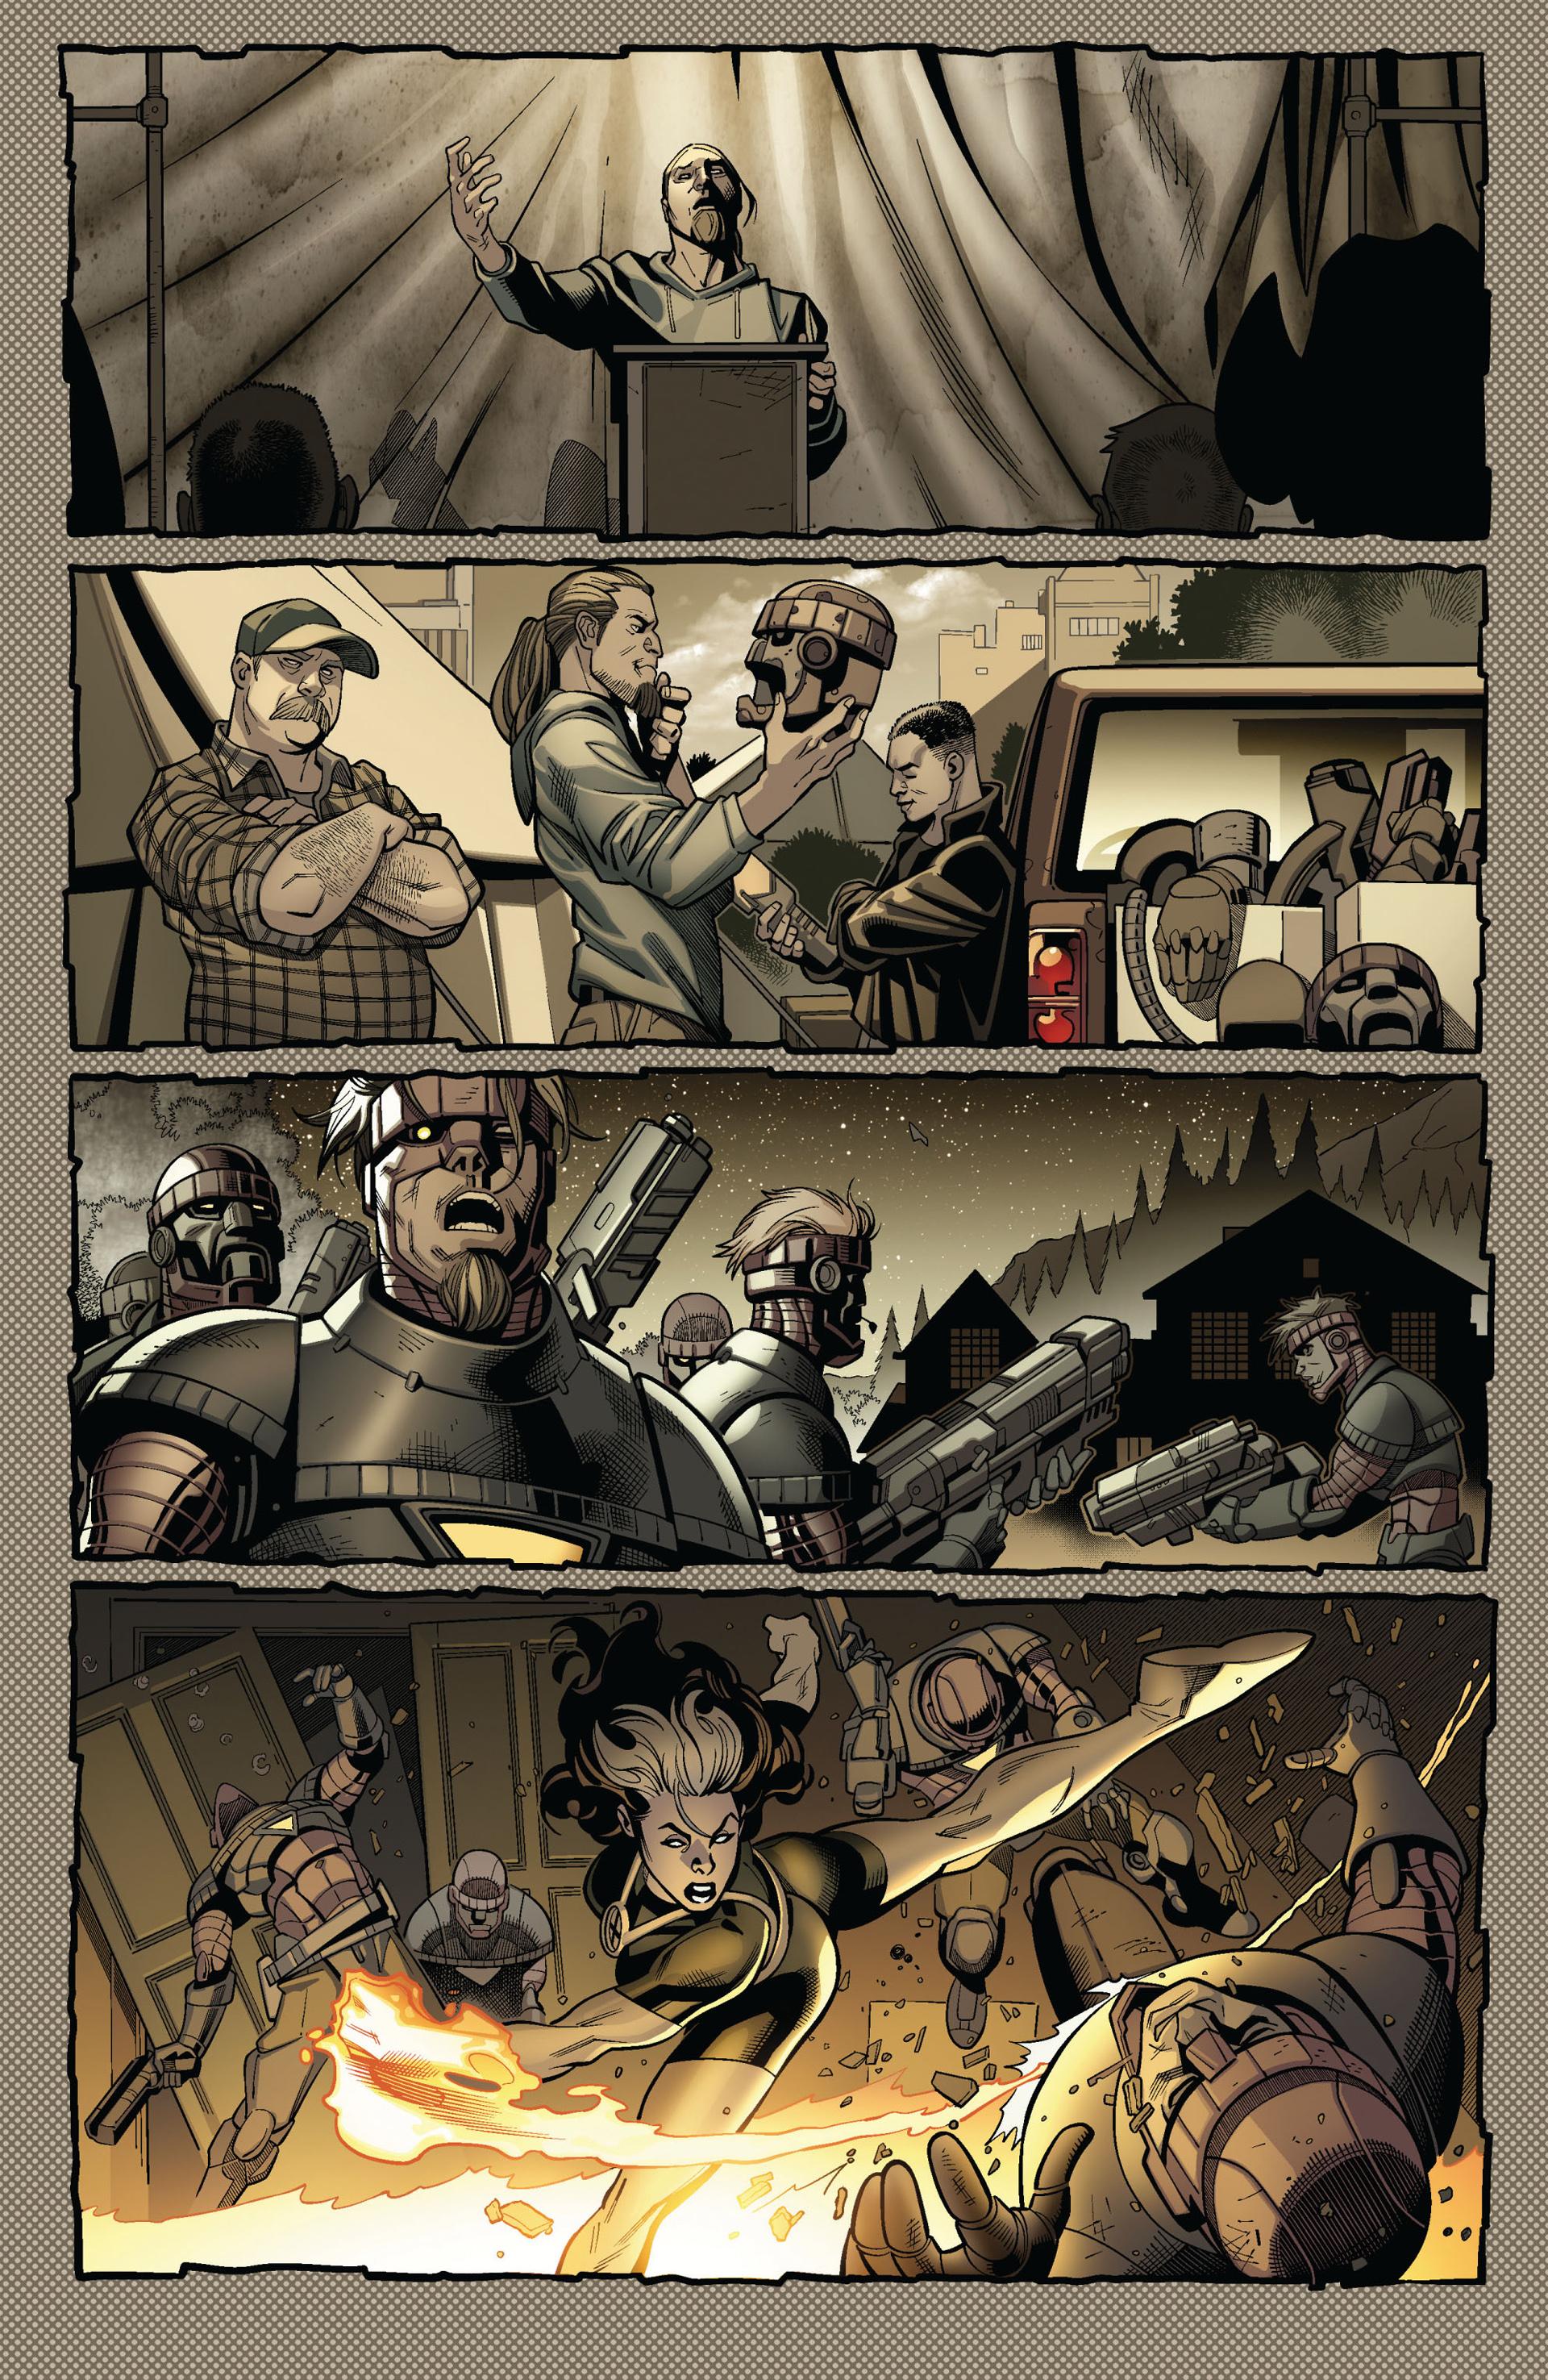 Read online Ultimate Comics X-Men comic -  Issue #4 - 4